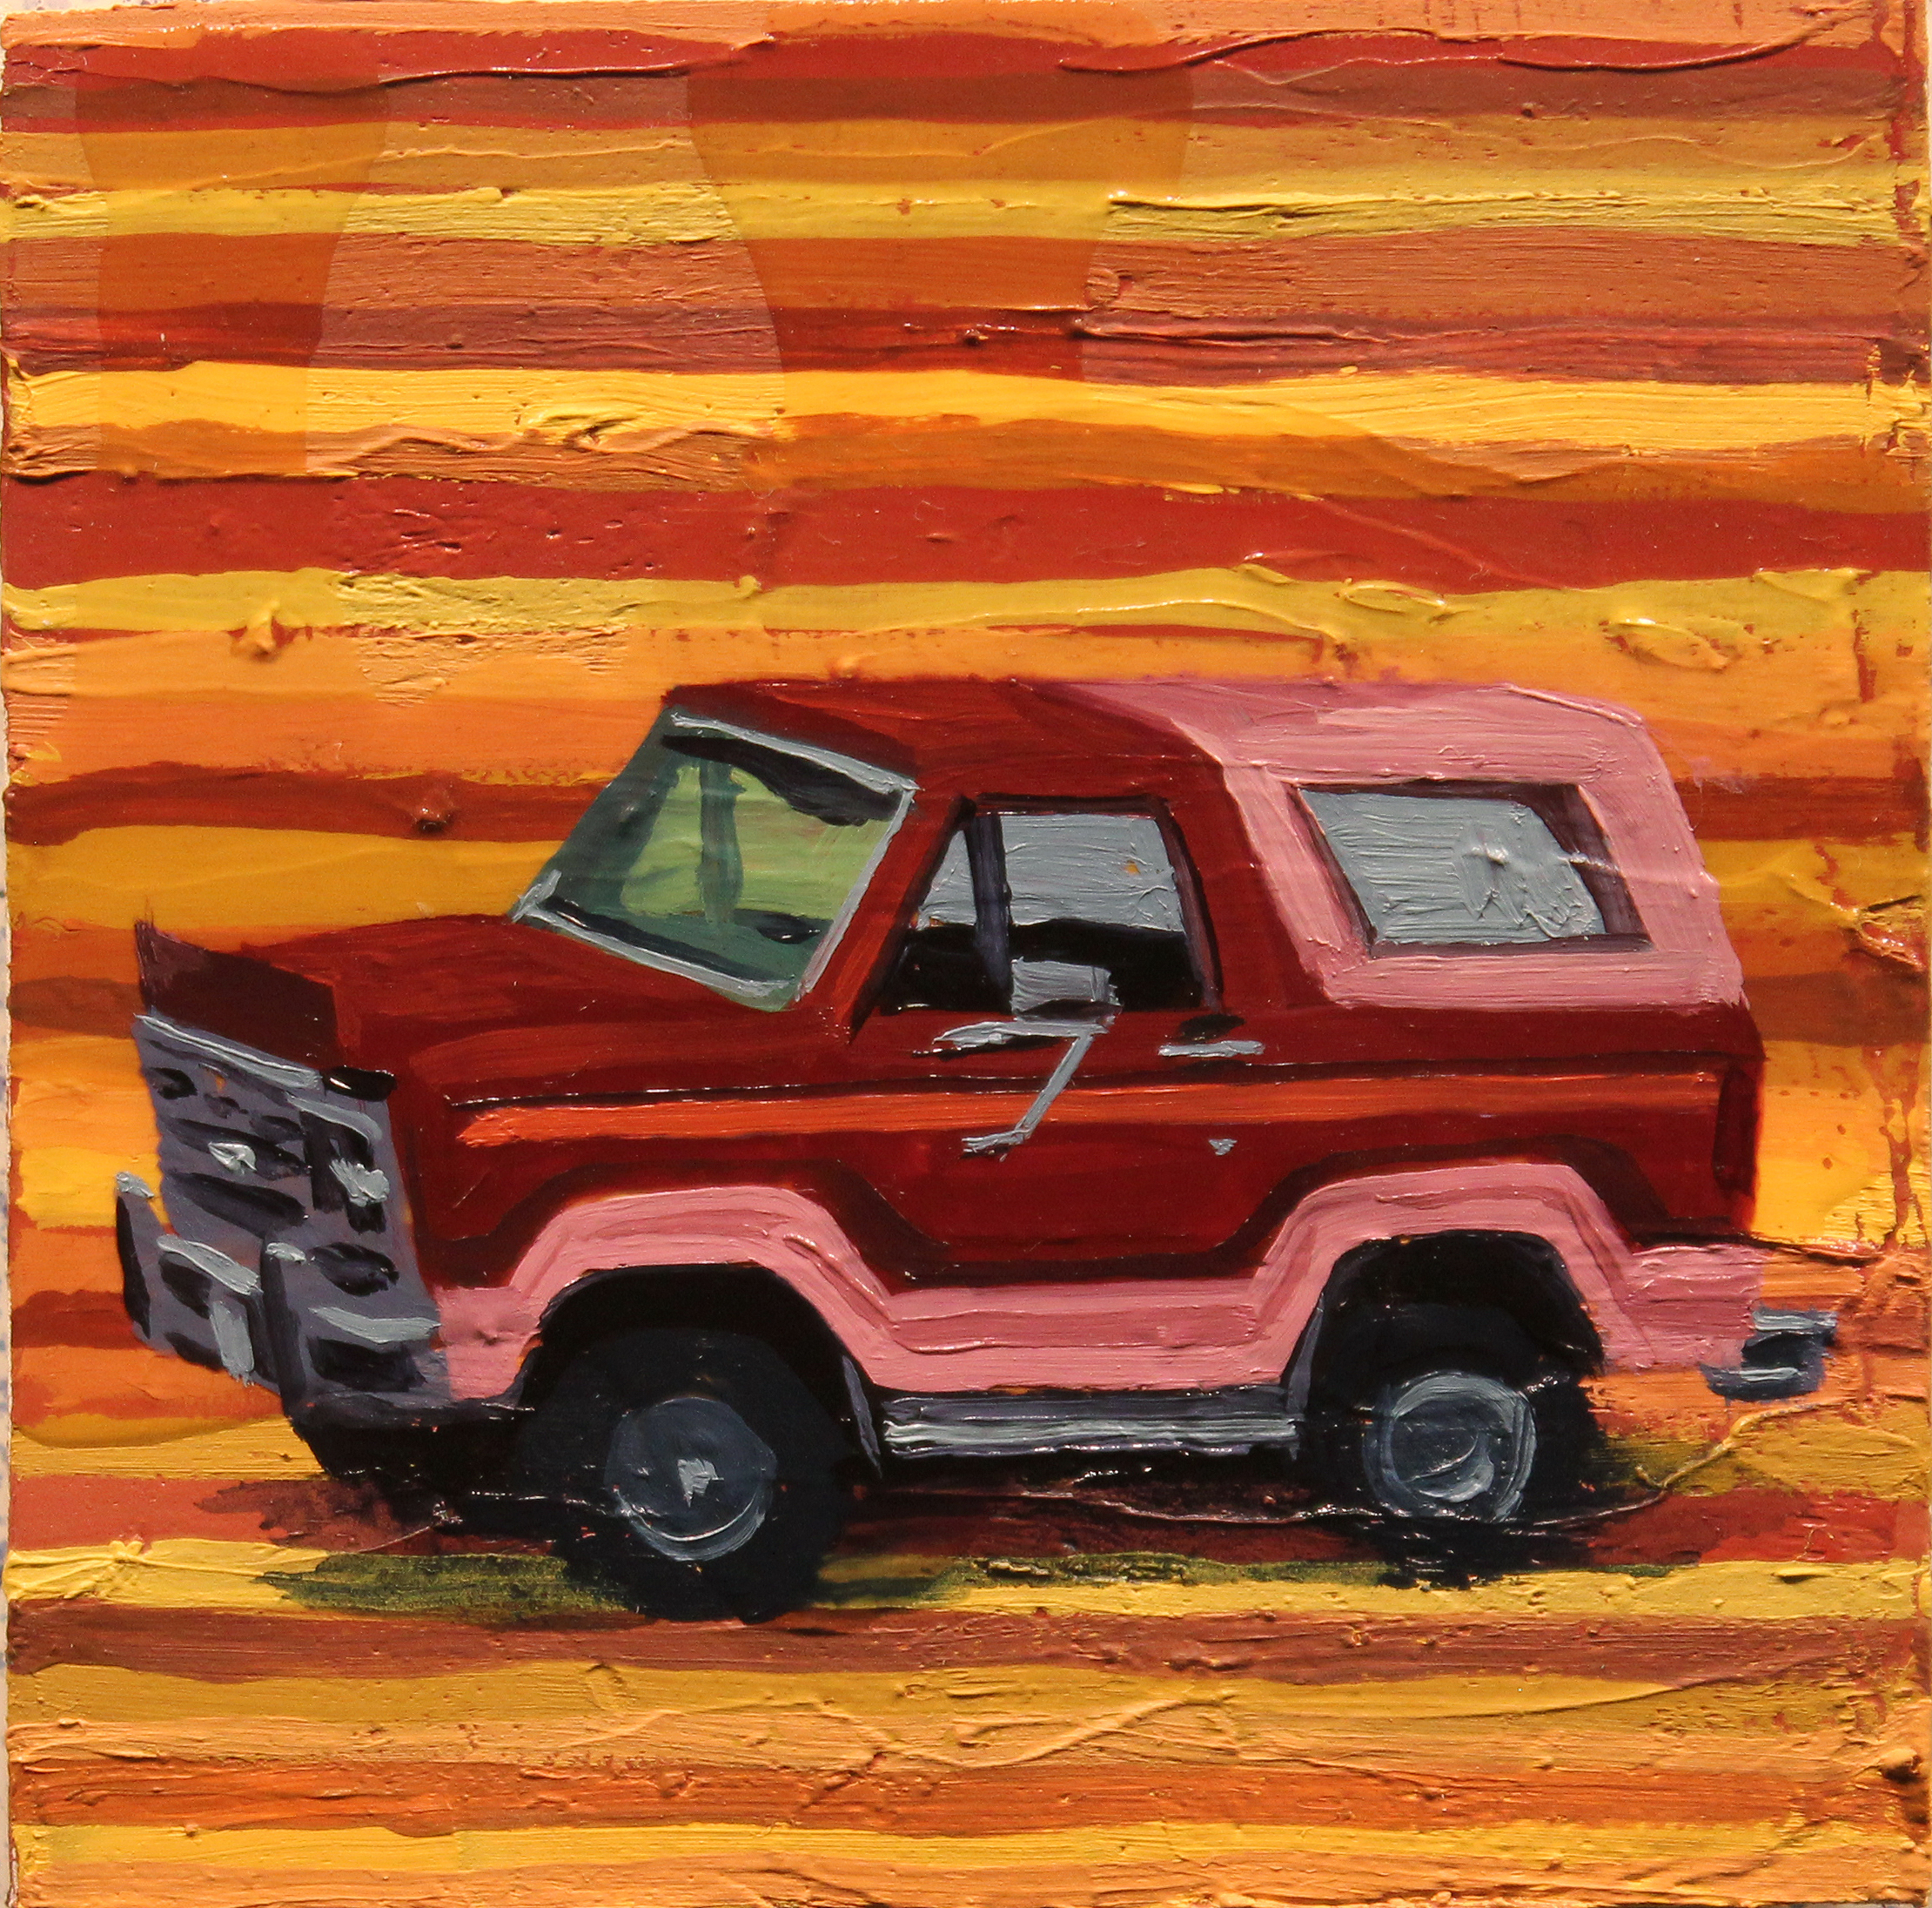 """El Bronco"", oil on wood, 4 x 4 inches, 2017"